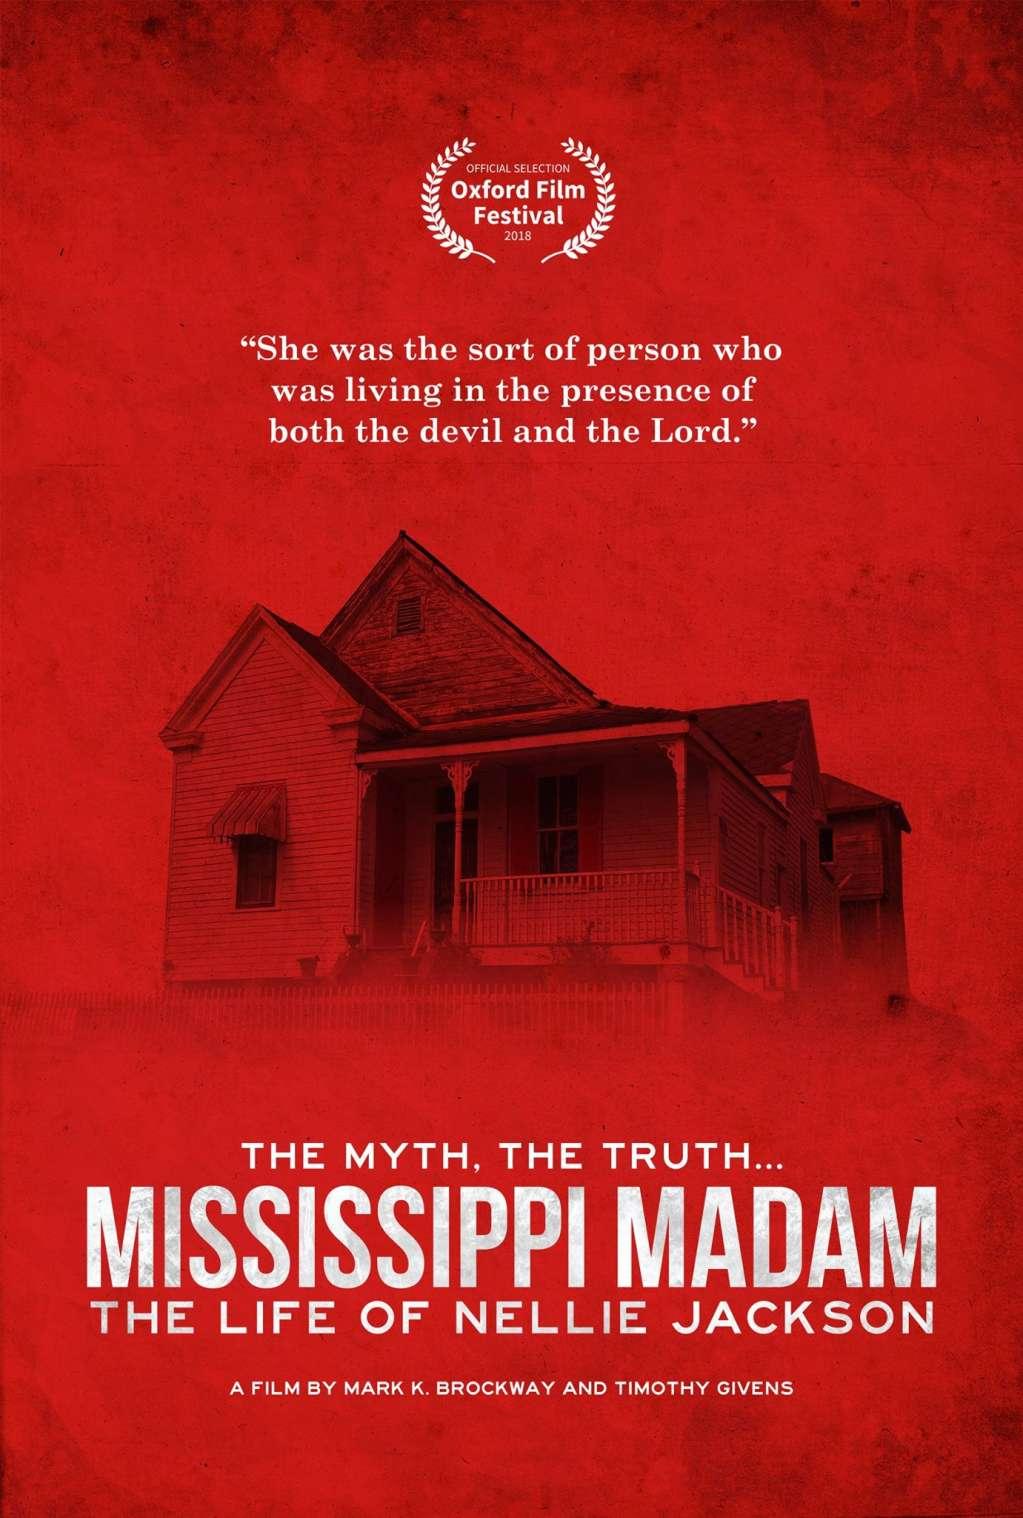 Mississippi Madam: The Life of Nellie Jackson kapak